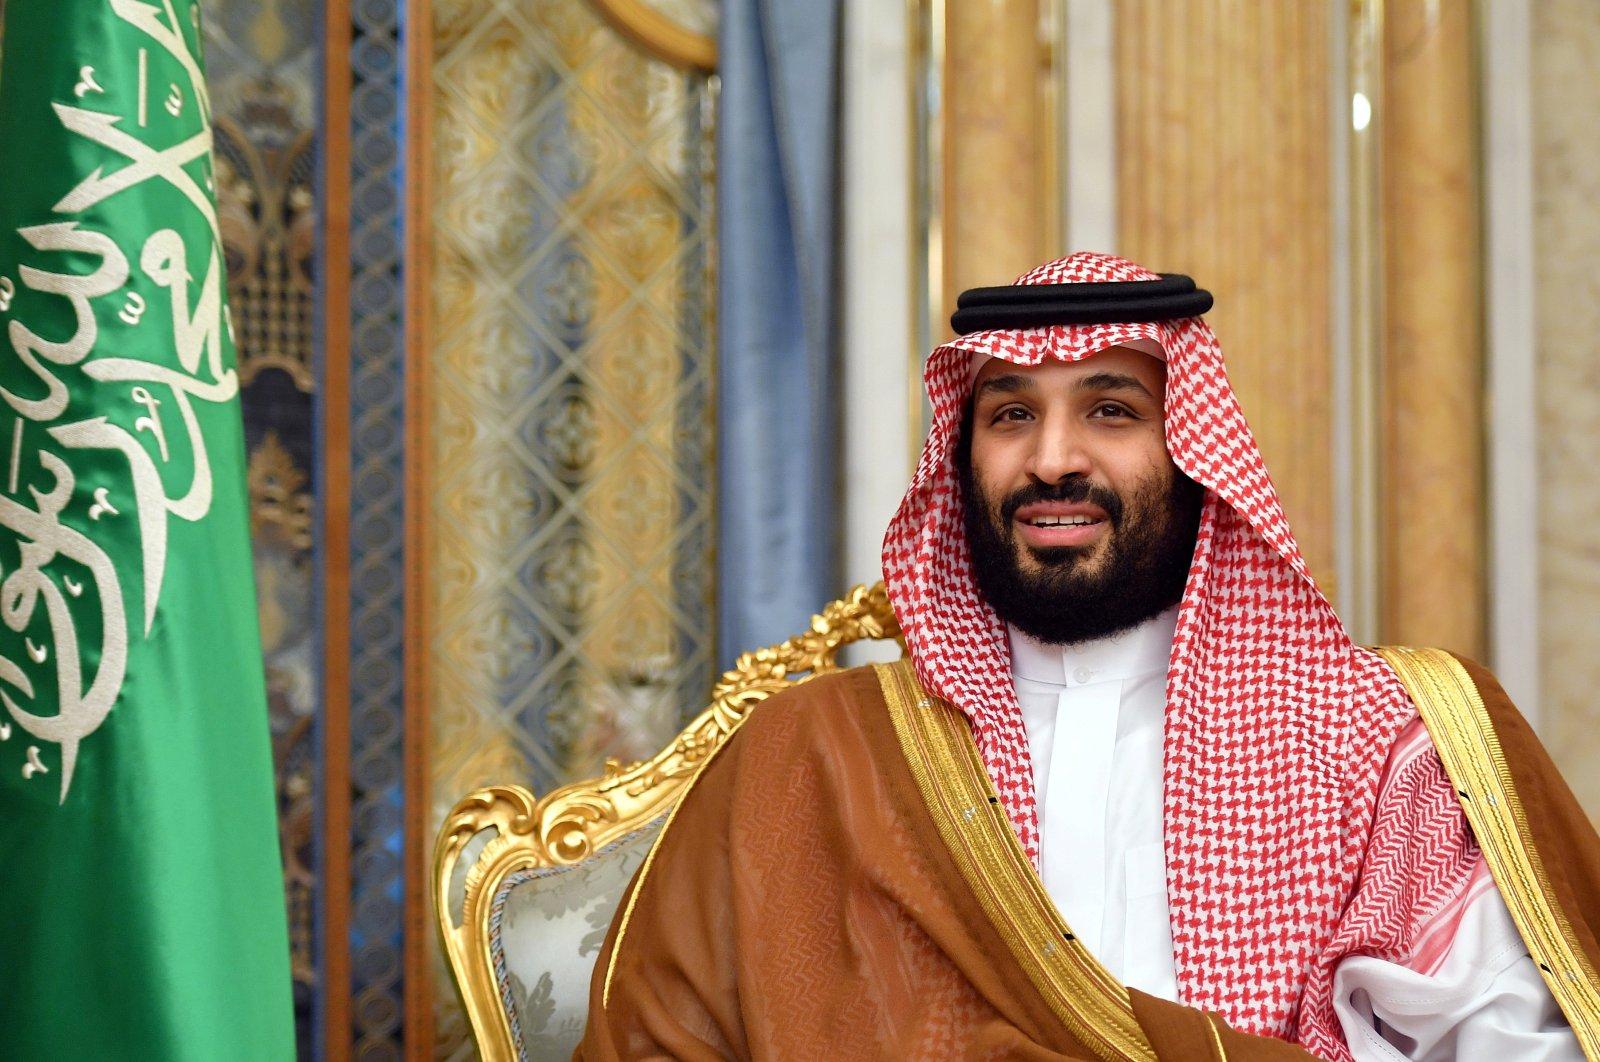 Saudi Arabia's Crown Prince Mohammed bin Salman attends a meeting with U.S. Secretary of State Mike Pompeo in Jeddah, Saudi Arabia, September 18, 2019. (REUTERS Photo)